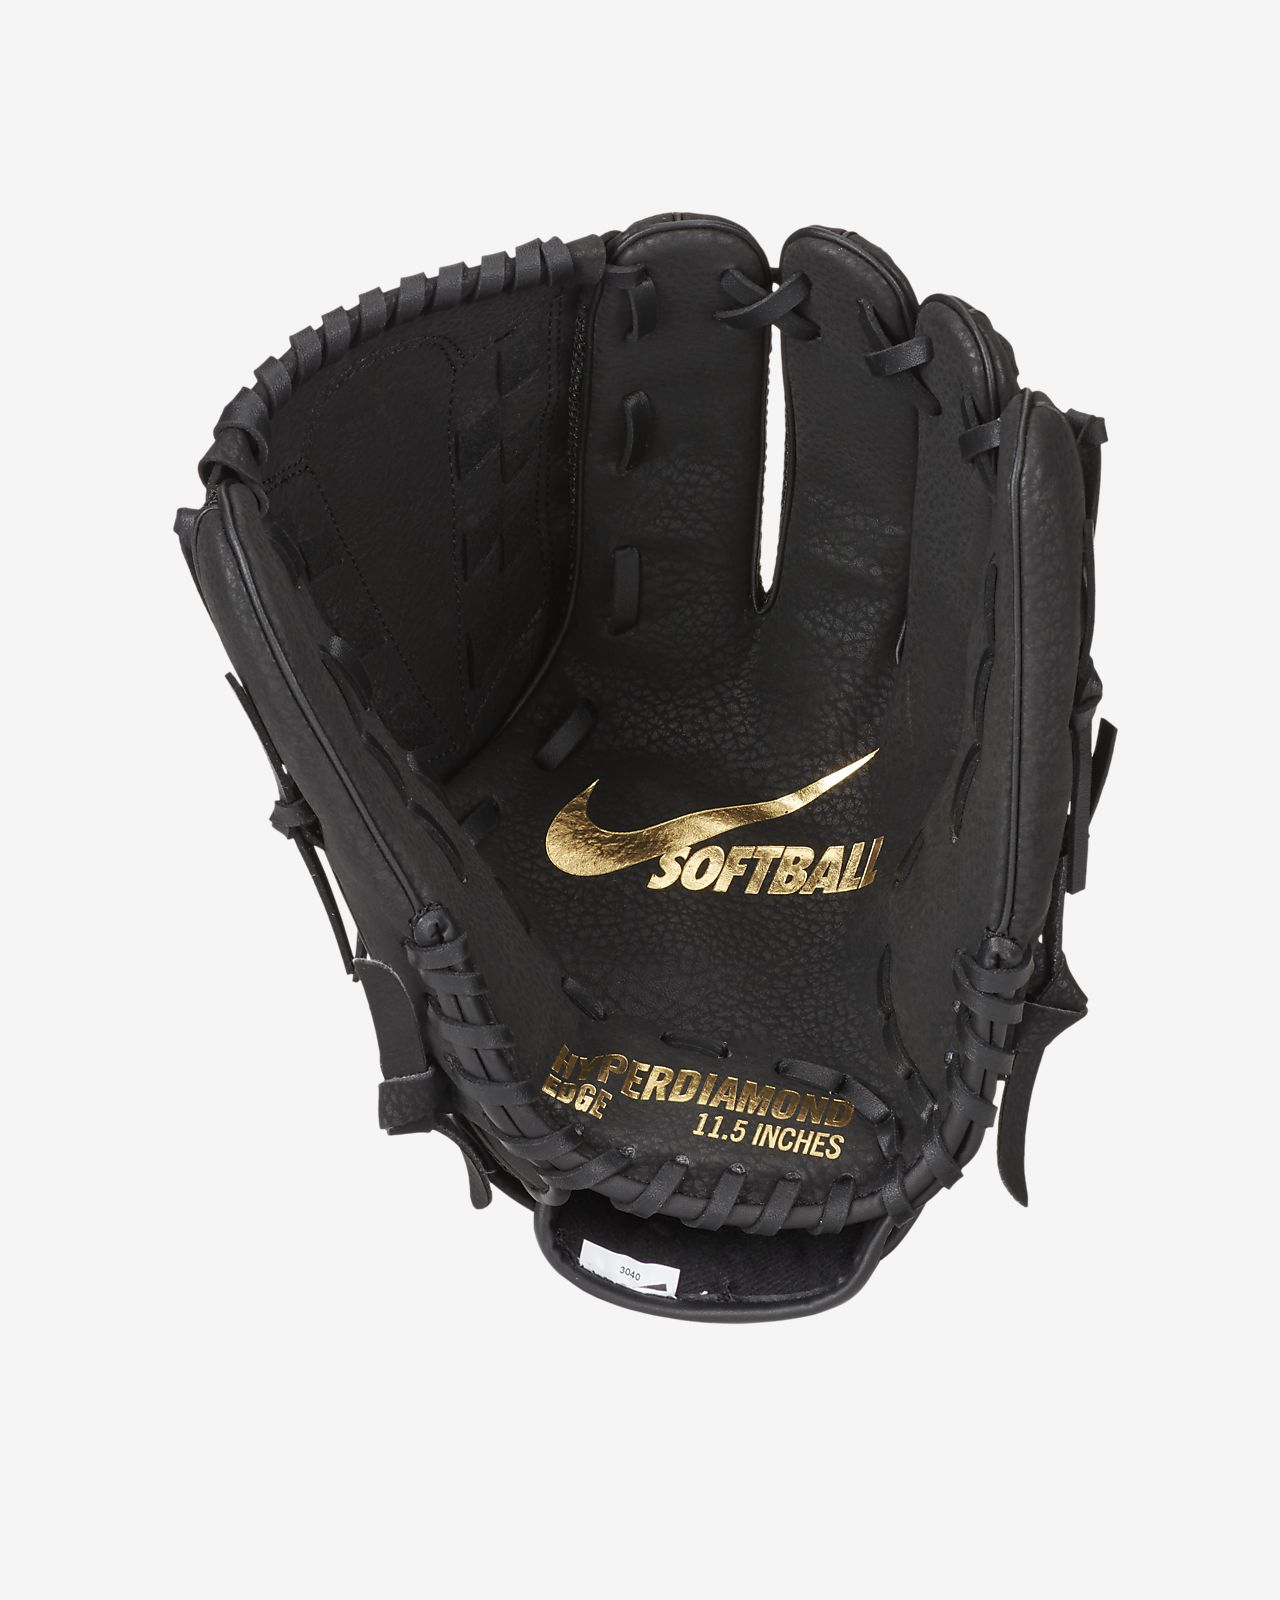 Nike Hyperdiamond Edge Kids' Softball Fielding Glove